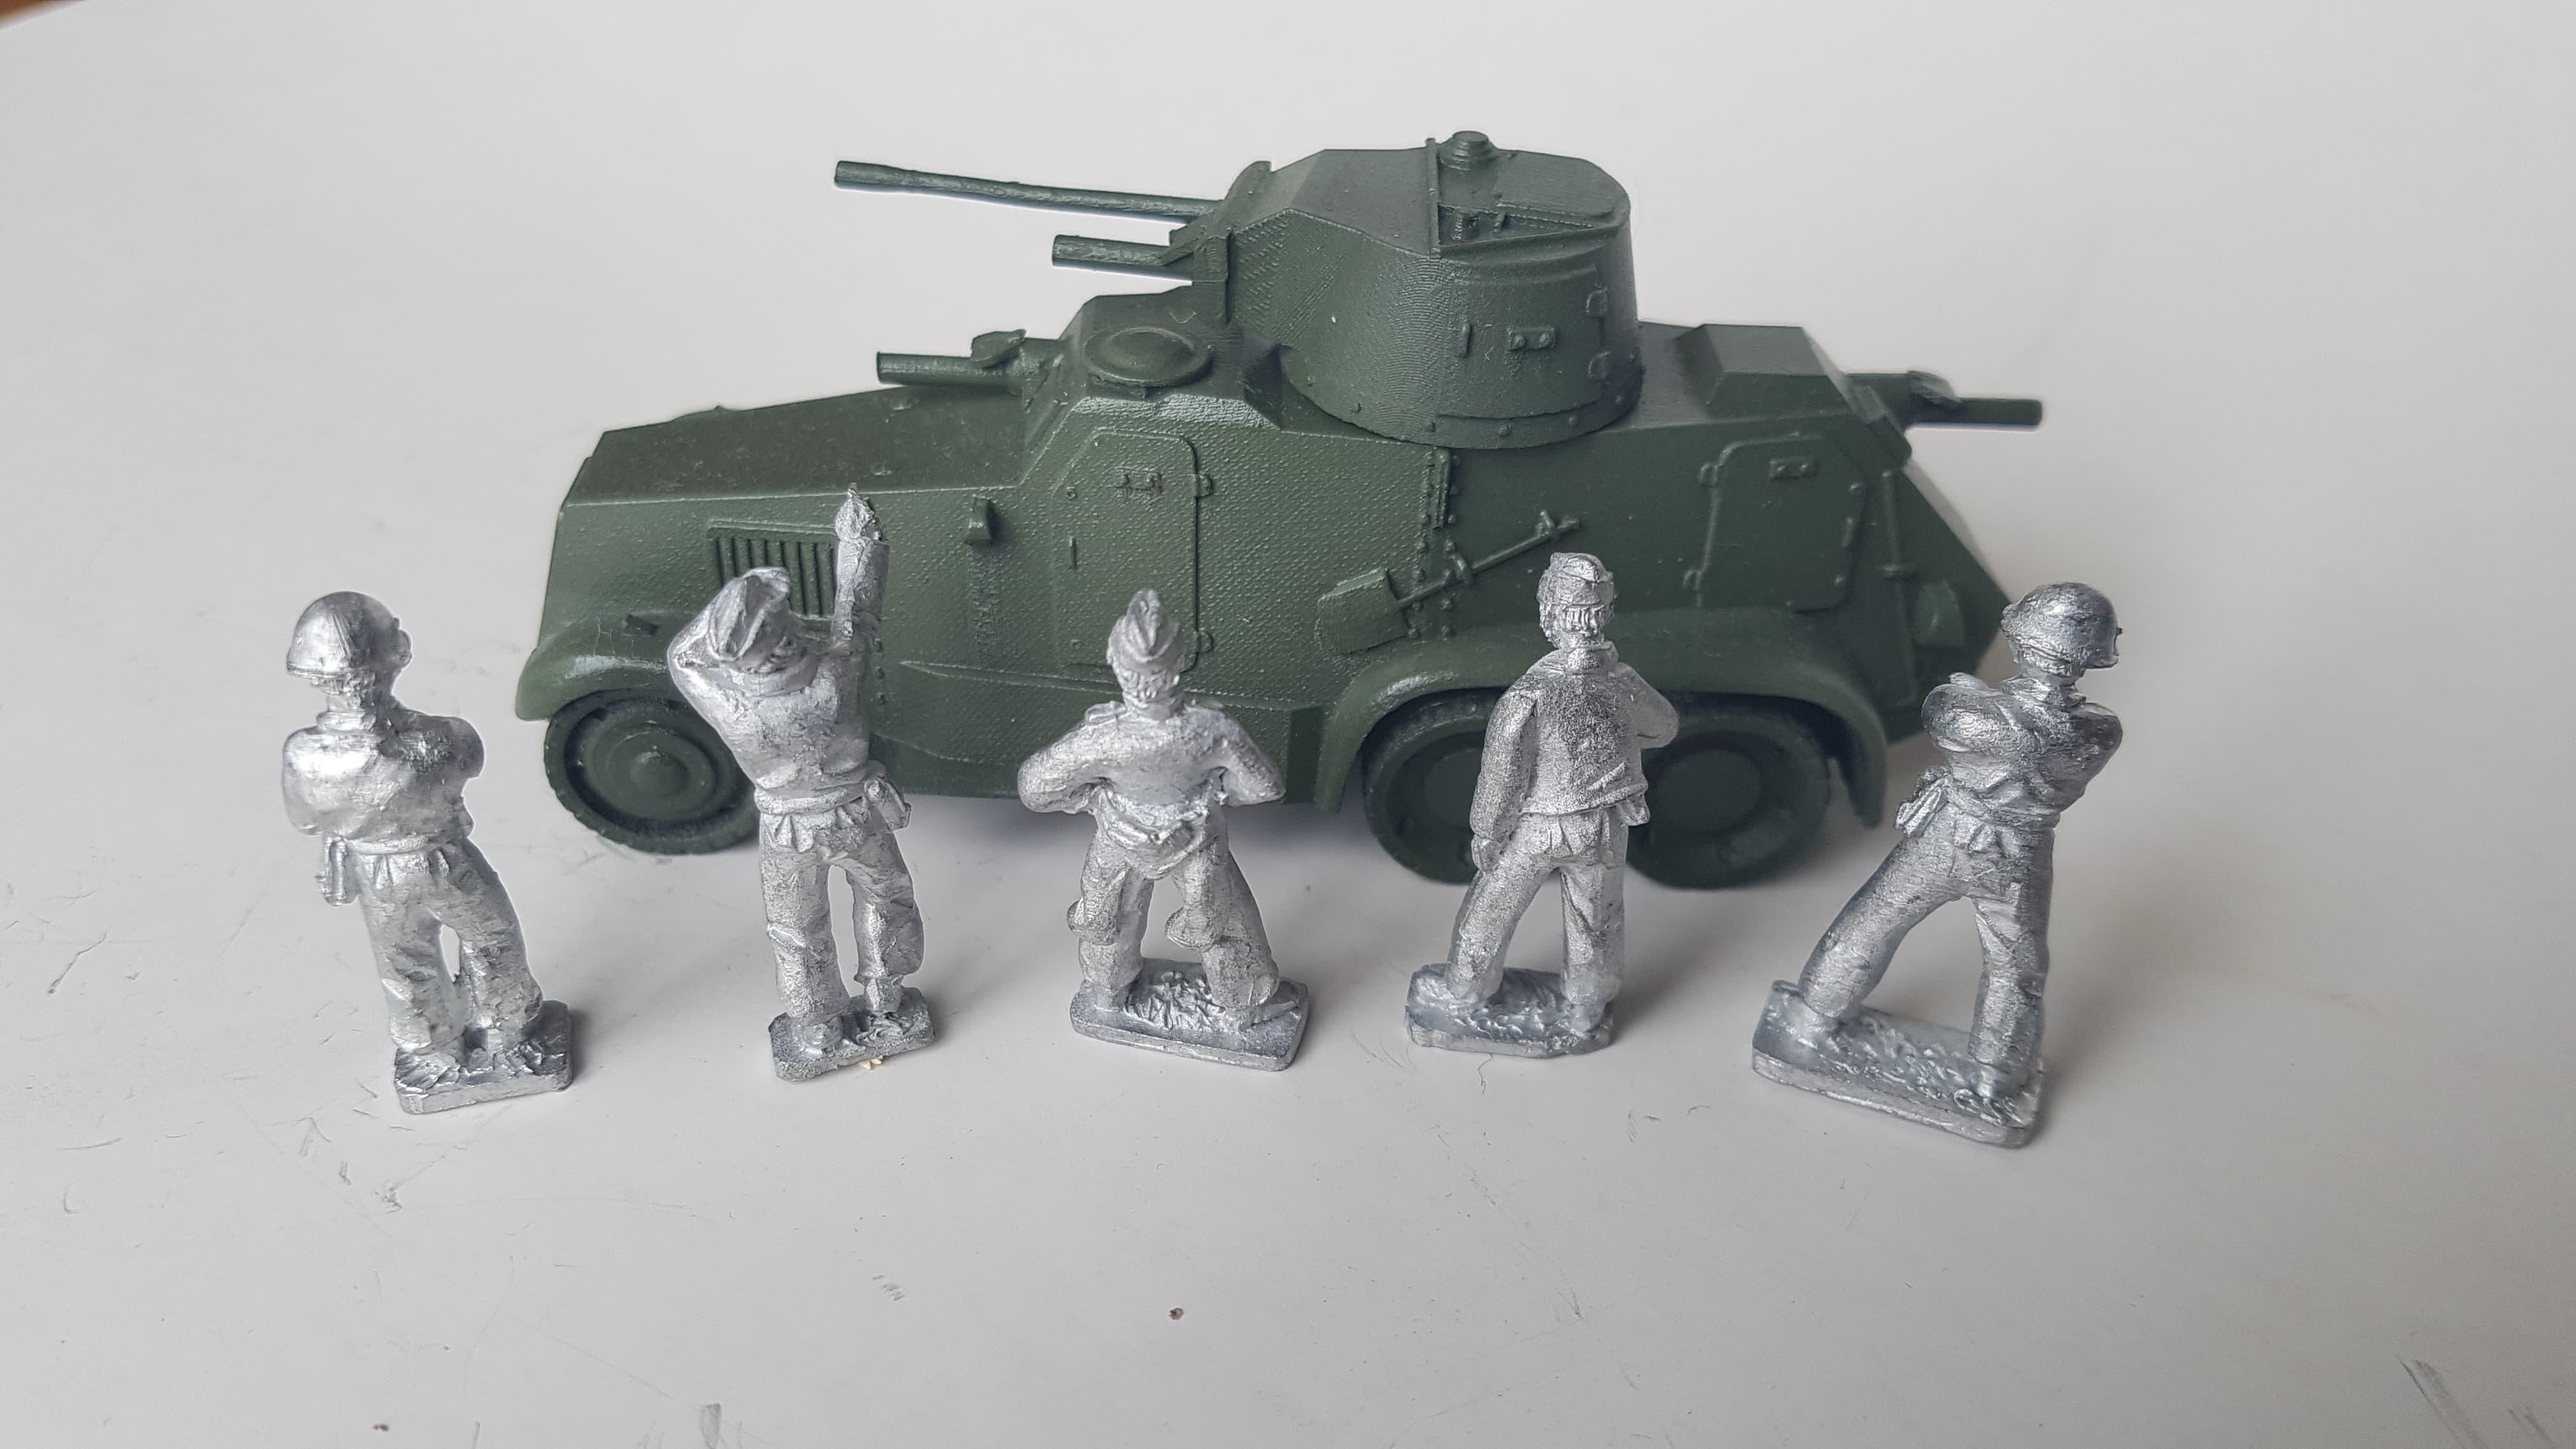 M40DU-VHC-02-Landsverk crew